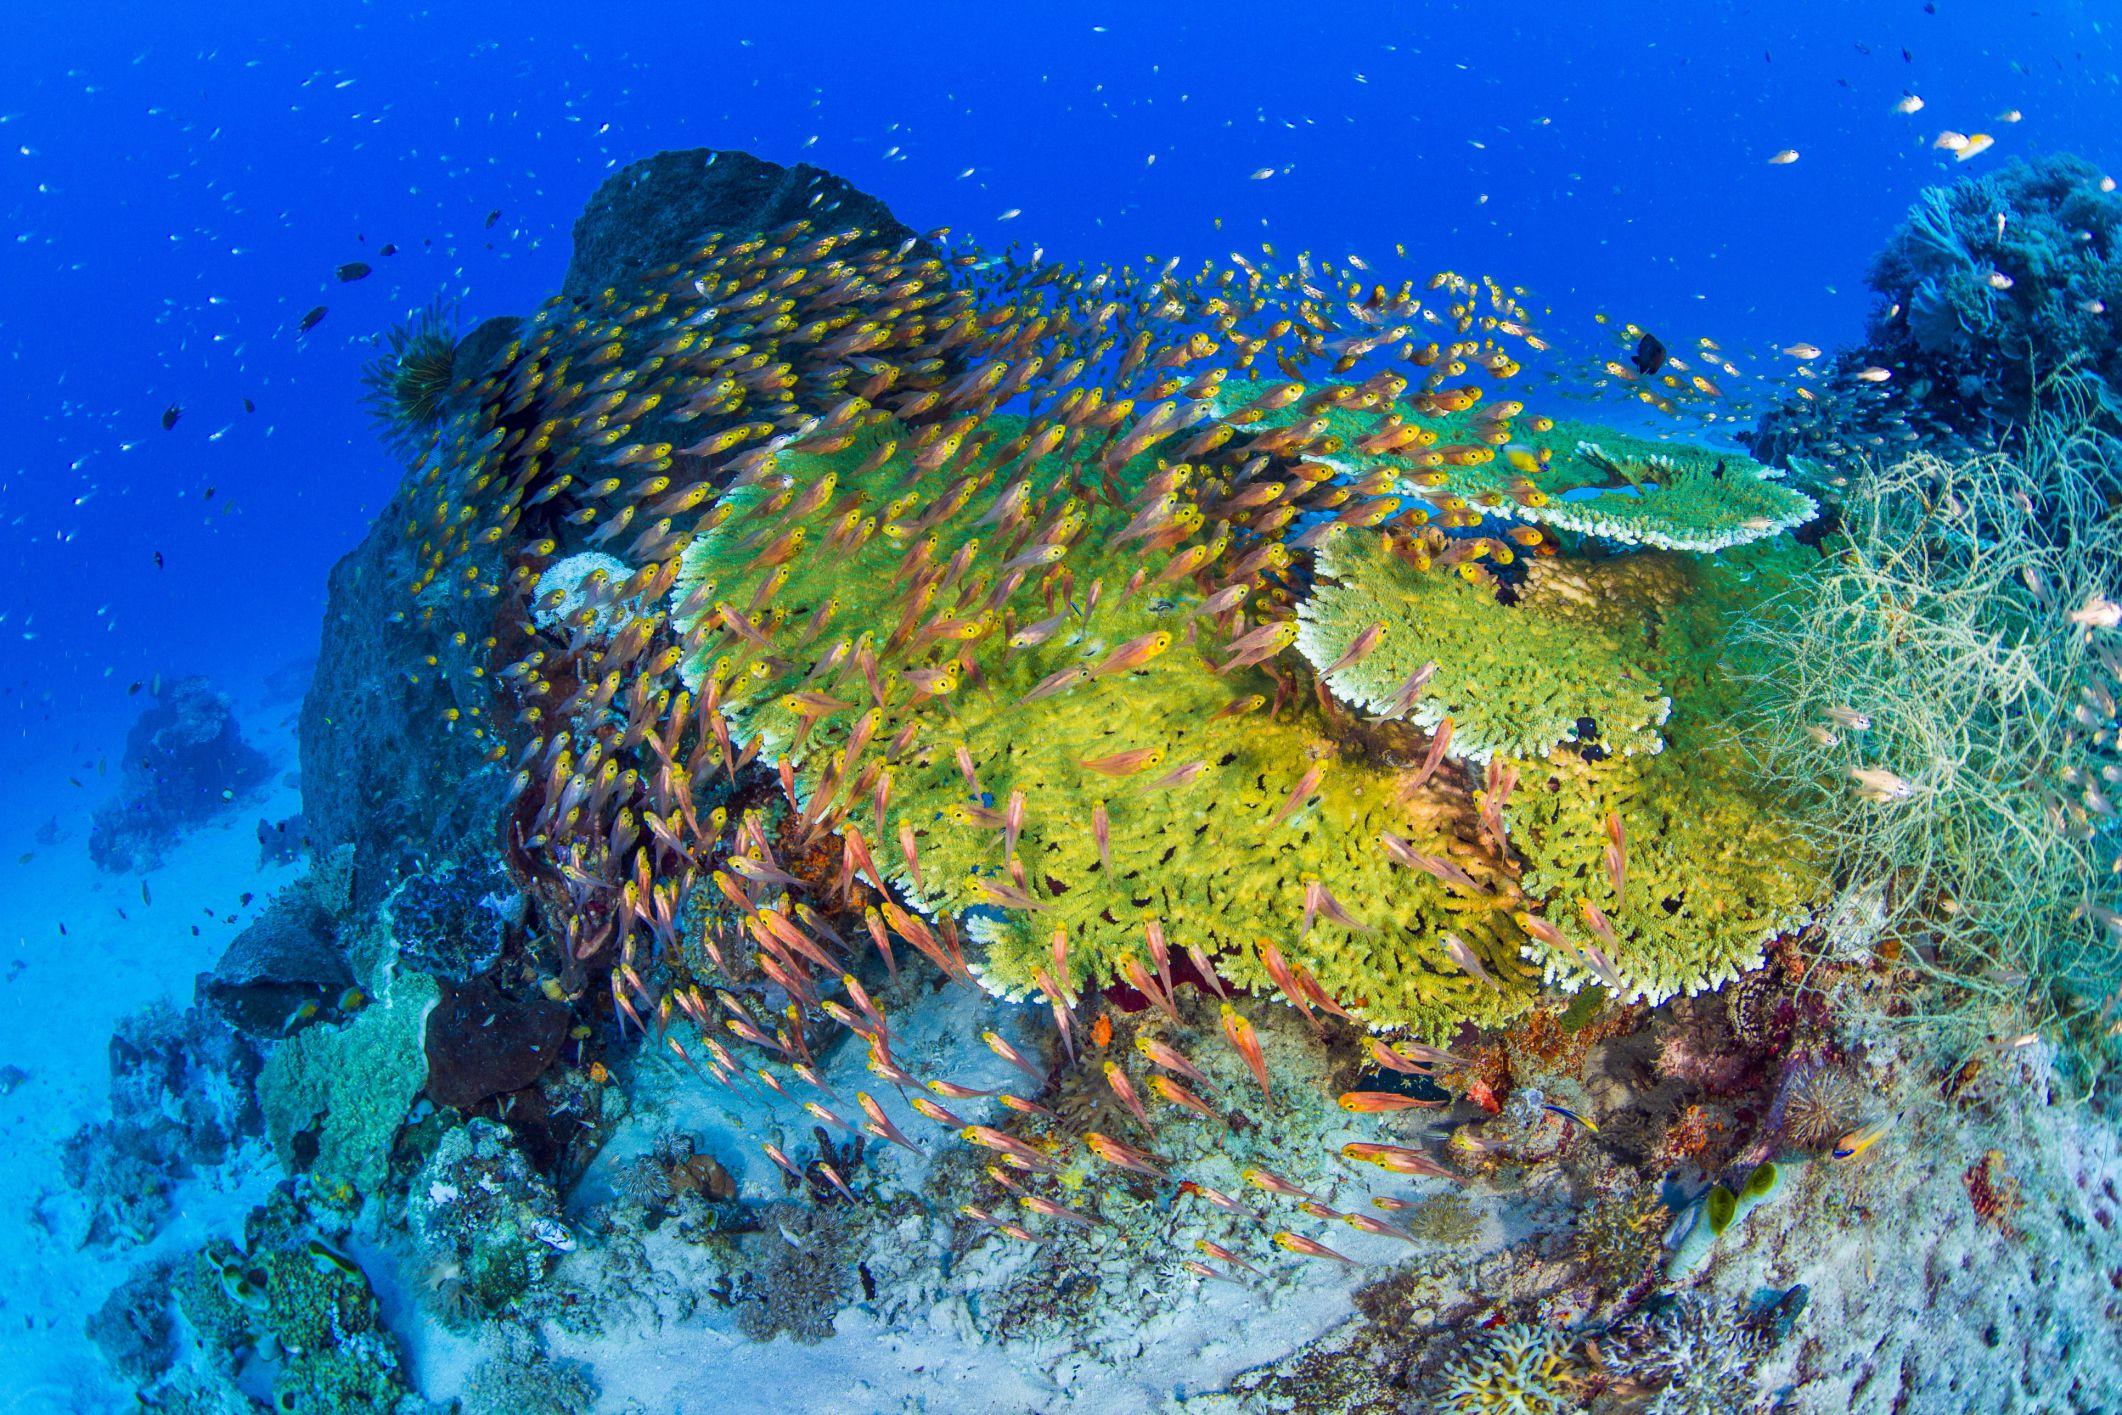 A school of fish swirl around a reef in a marine ecosystem